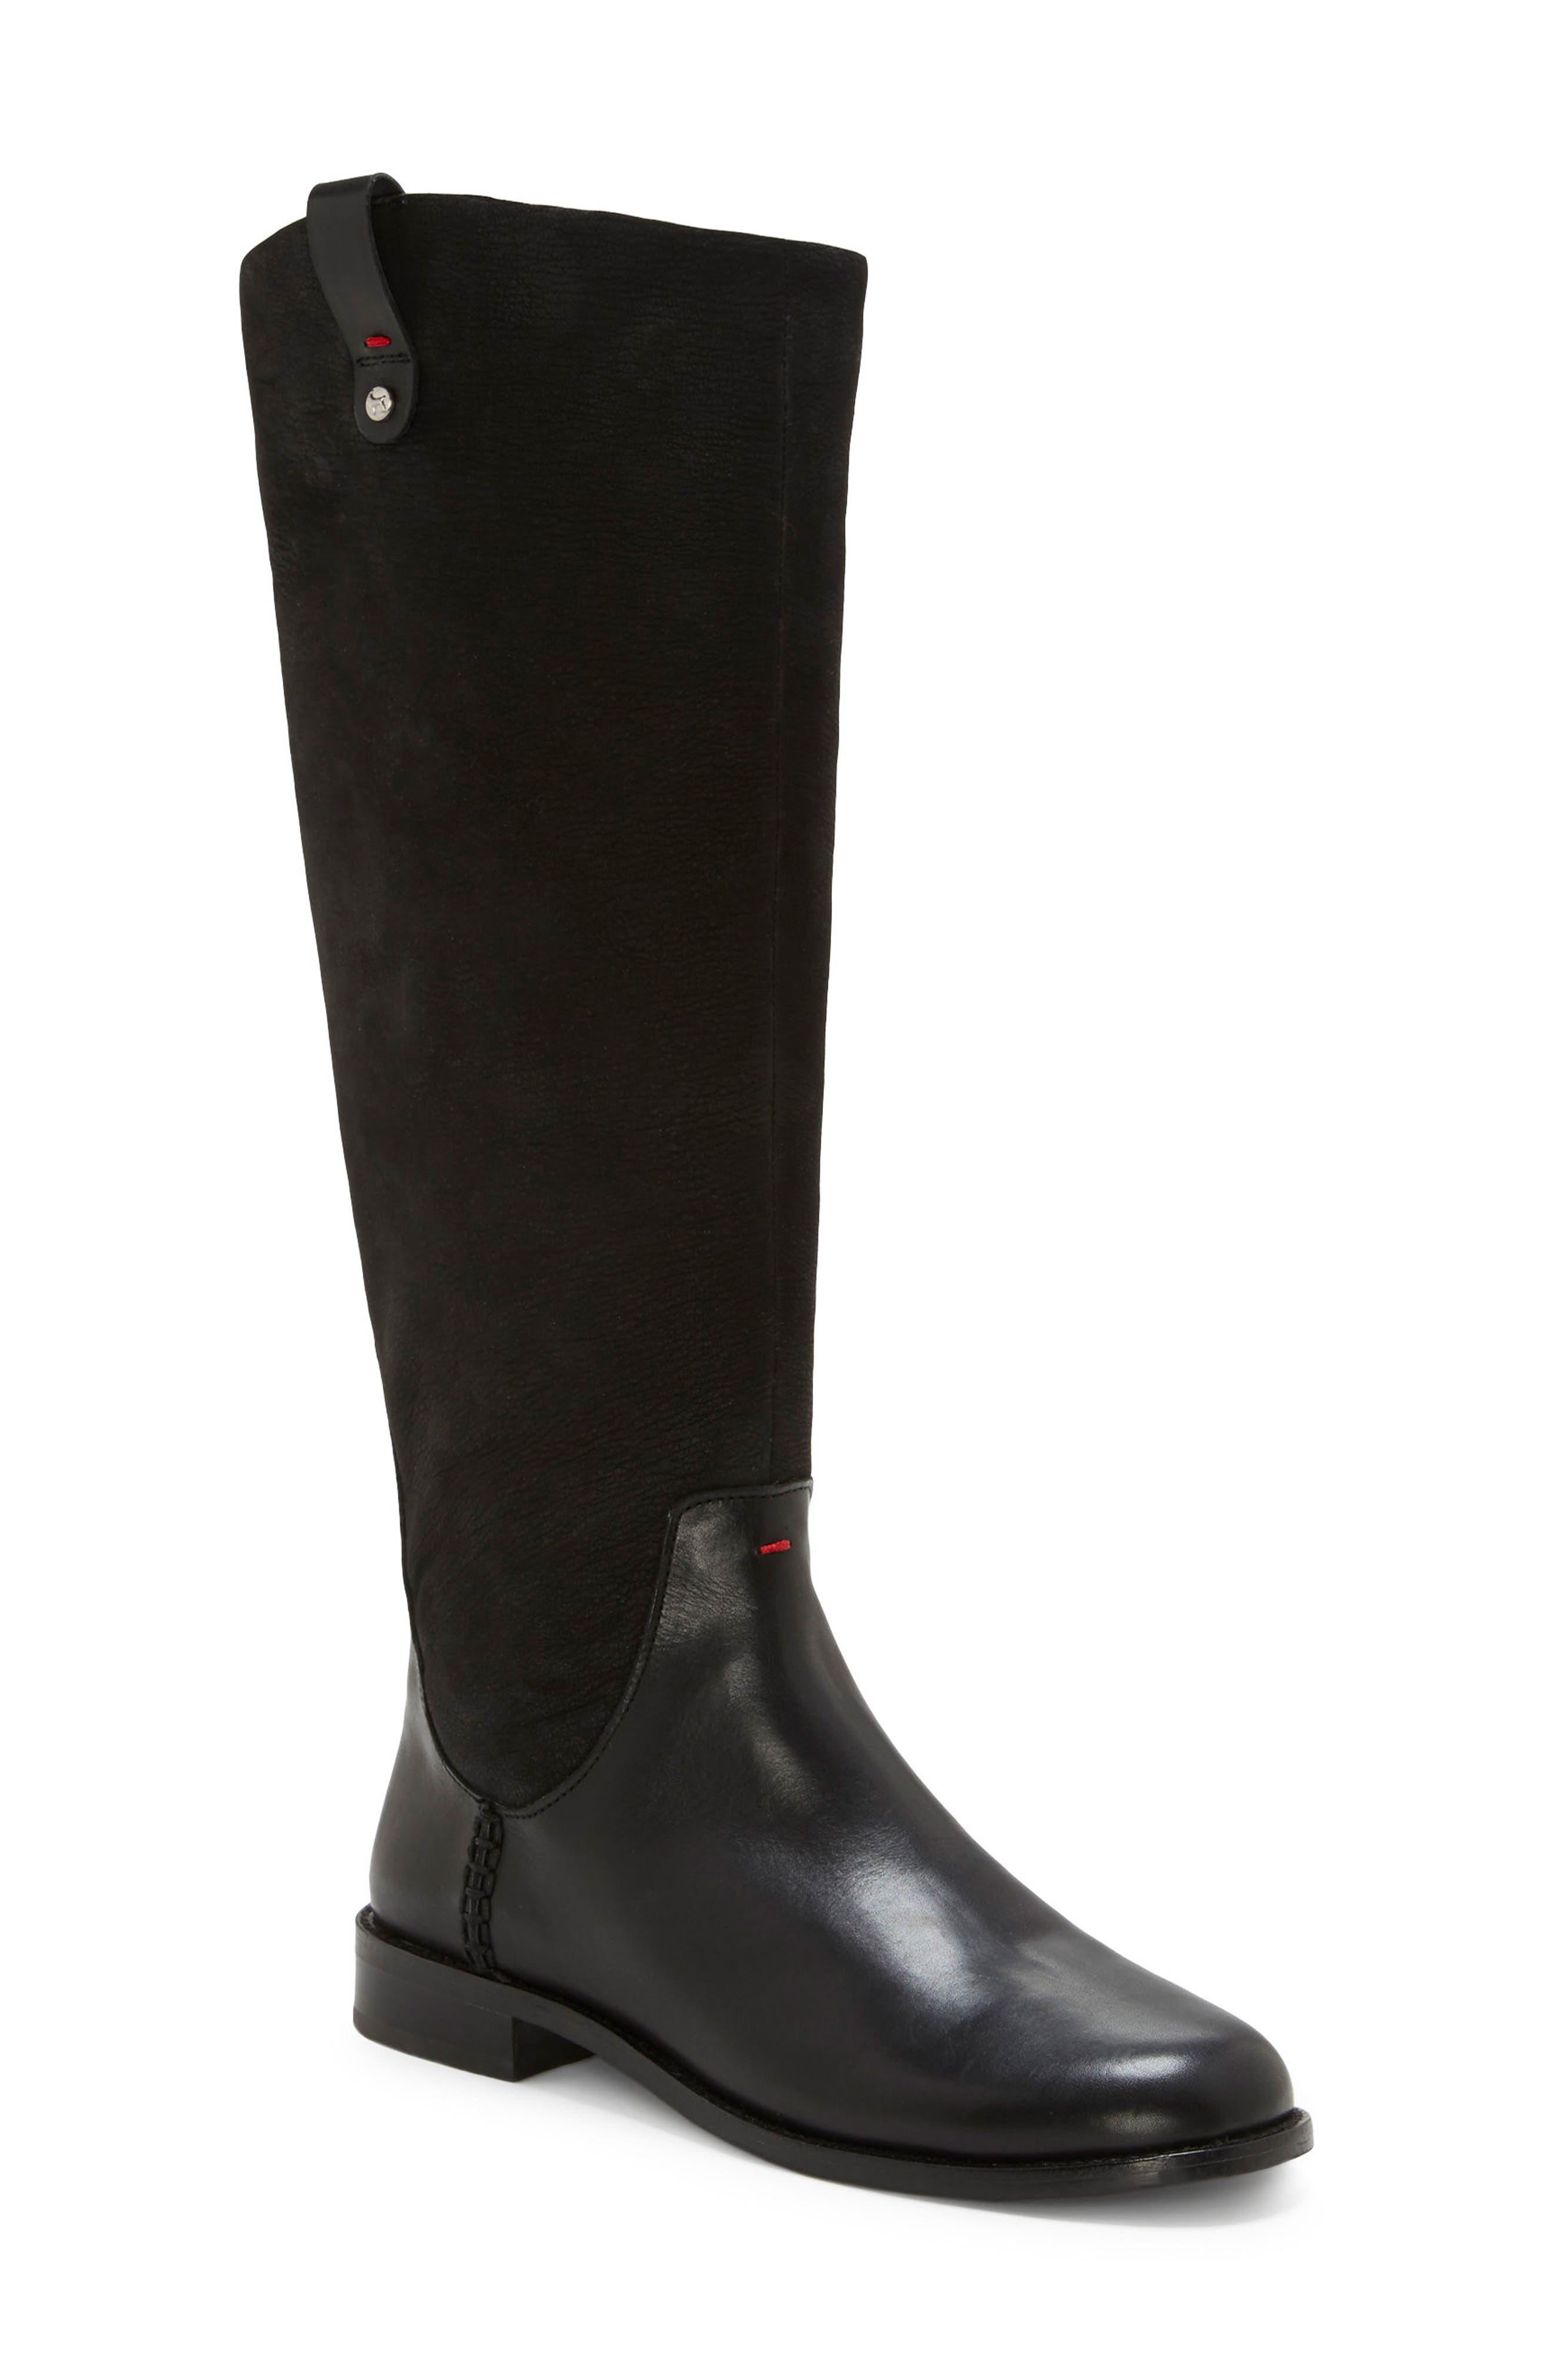 Main Image - ED Ellen DeGeneres 'Zoila' Riding Boot (Women)